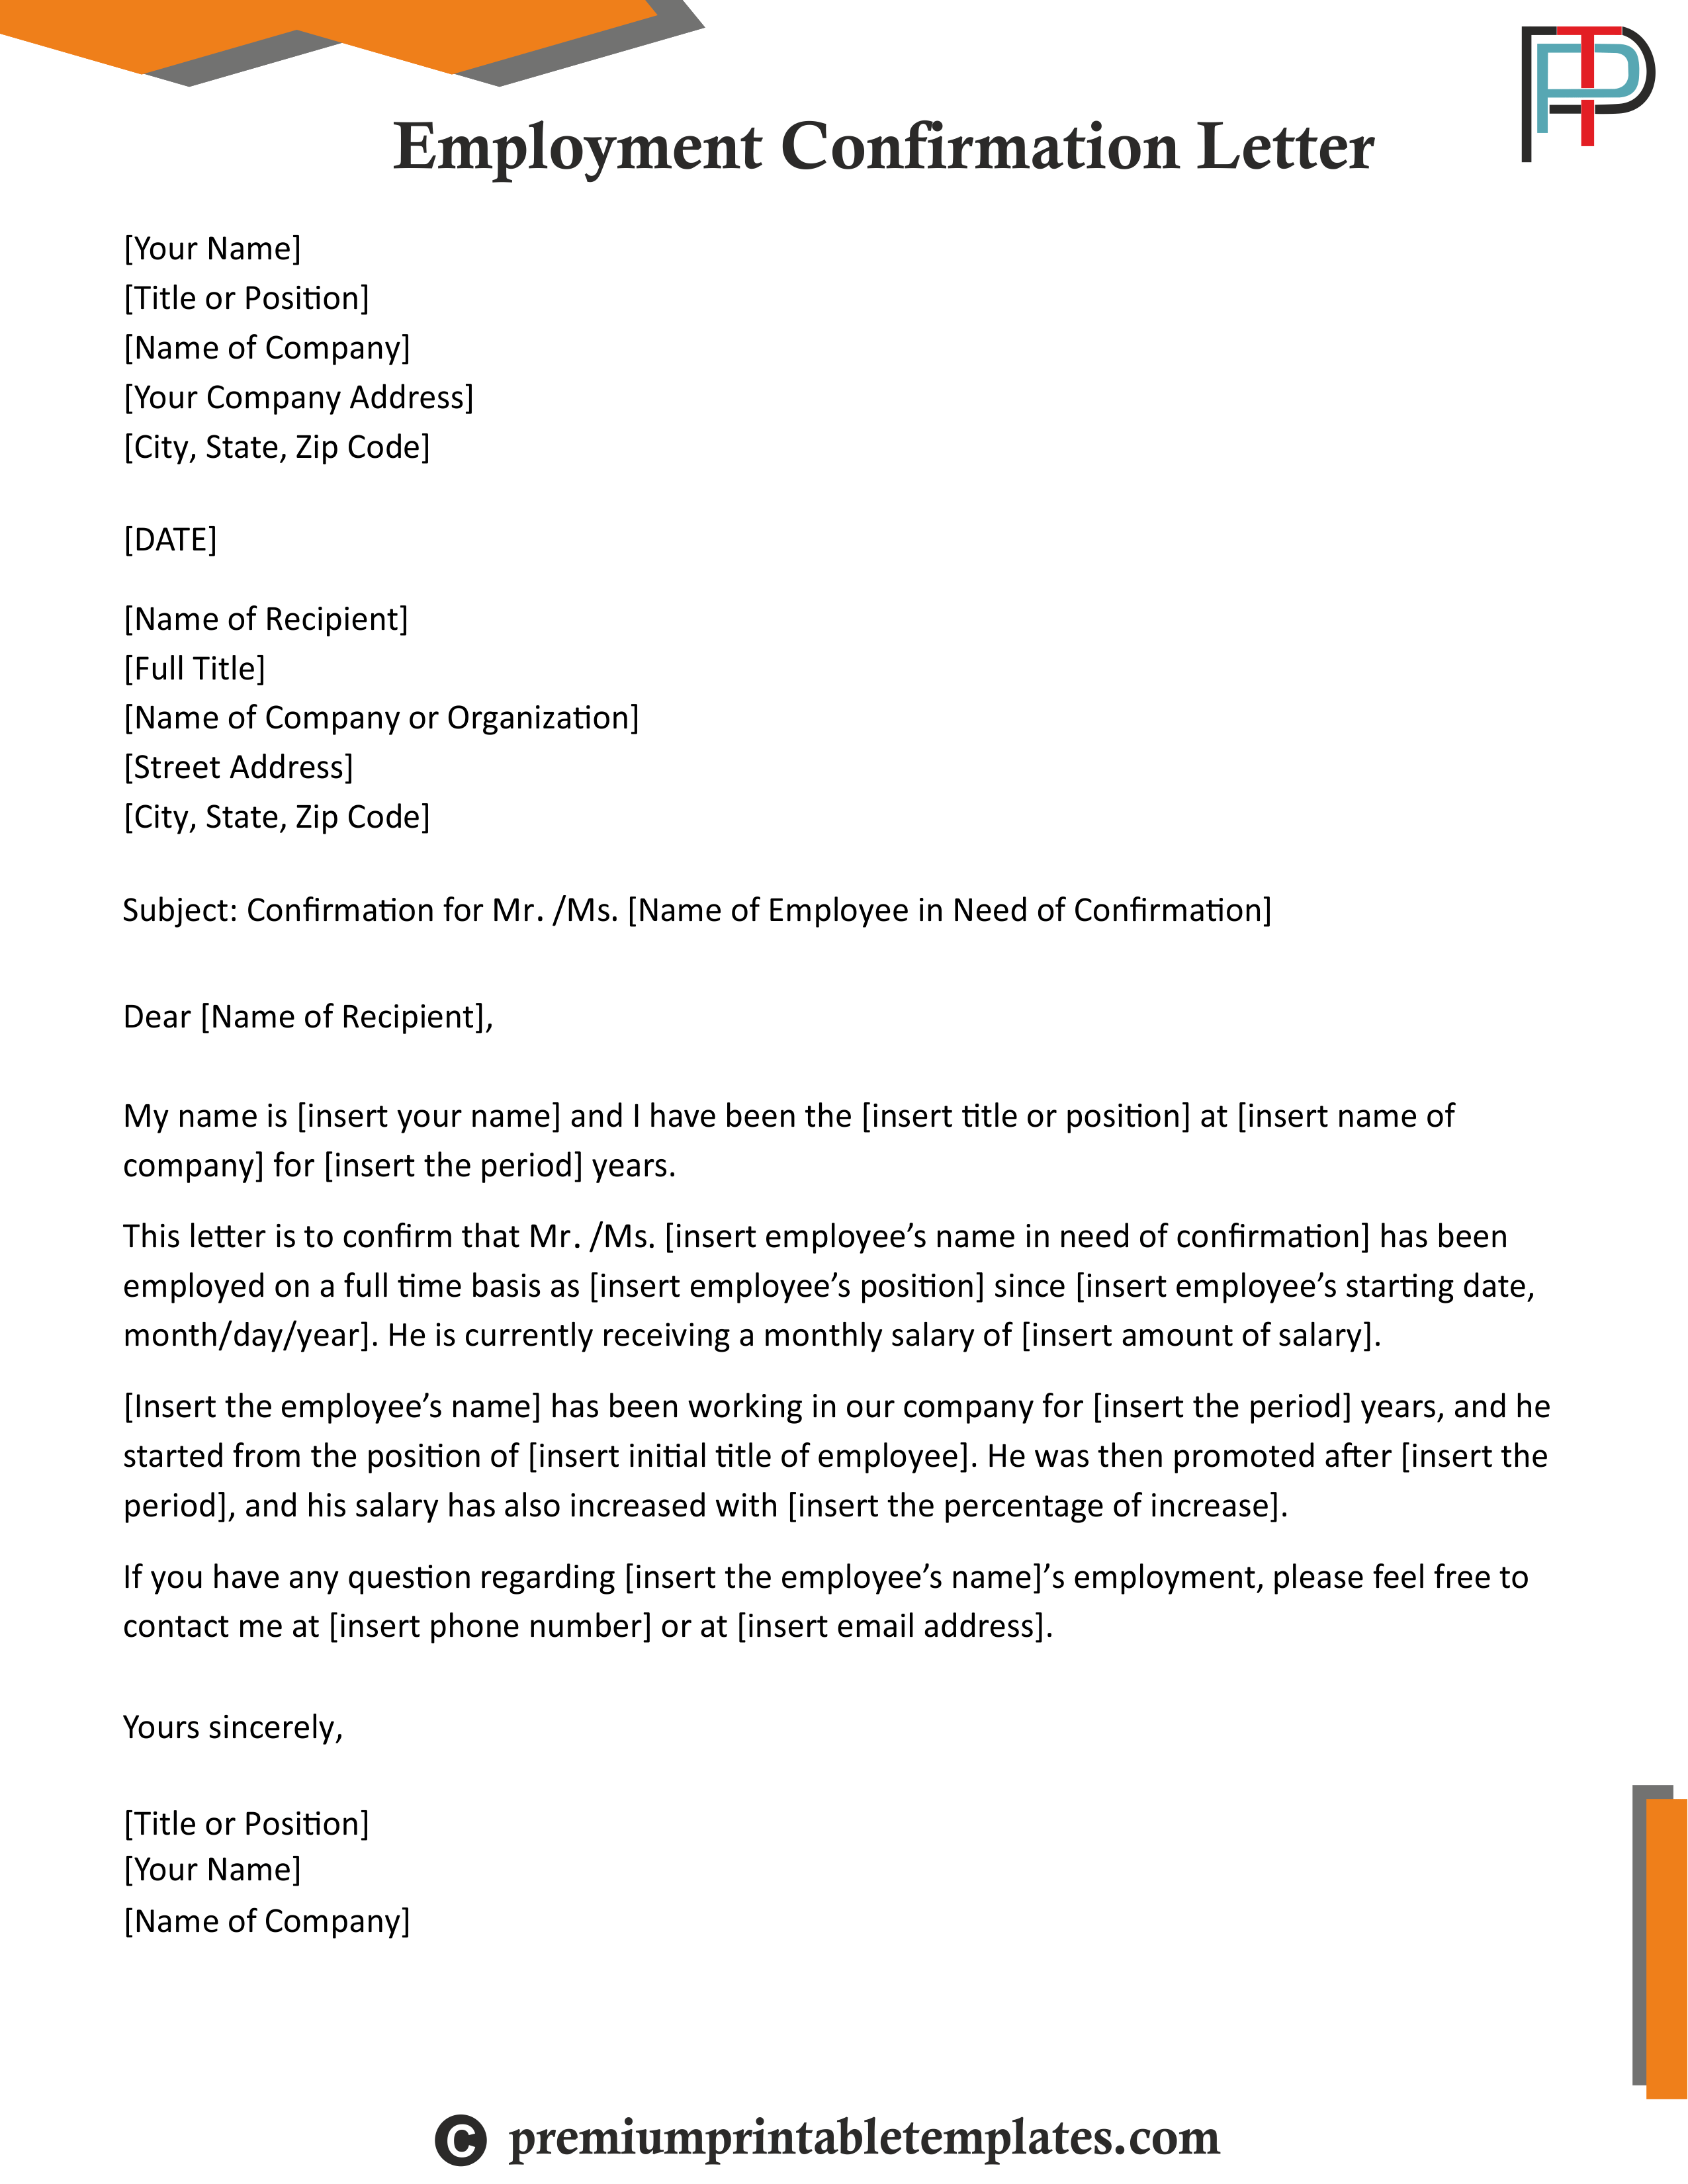 Employment Confirmation Letter Editable & PDF